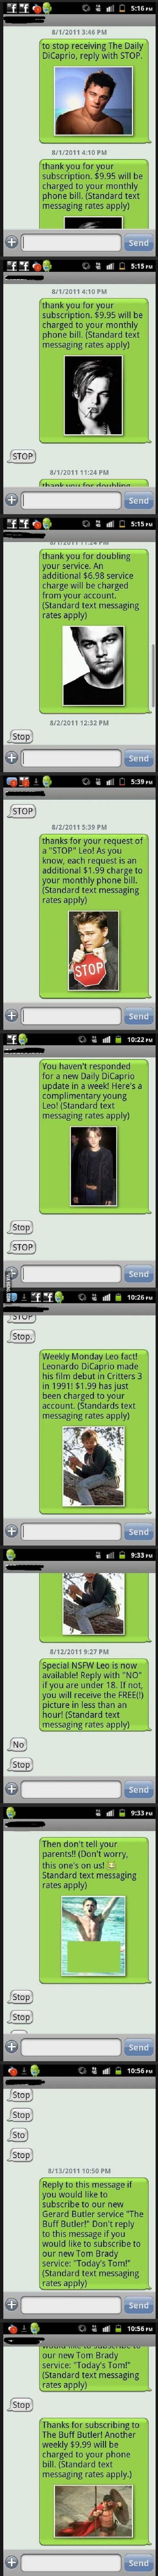 Epic Texting Troll